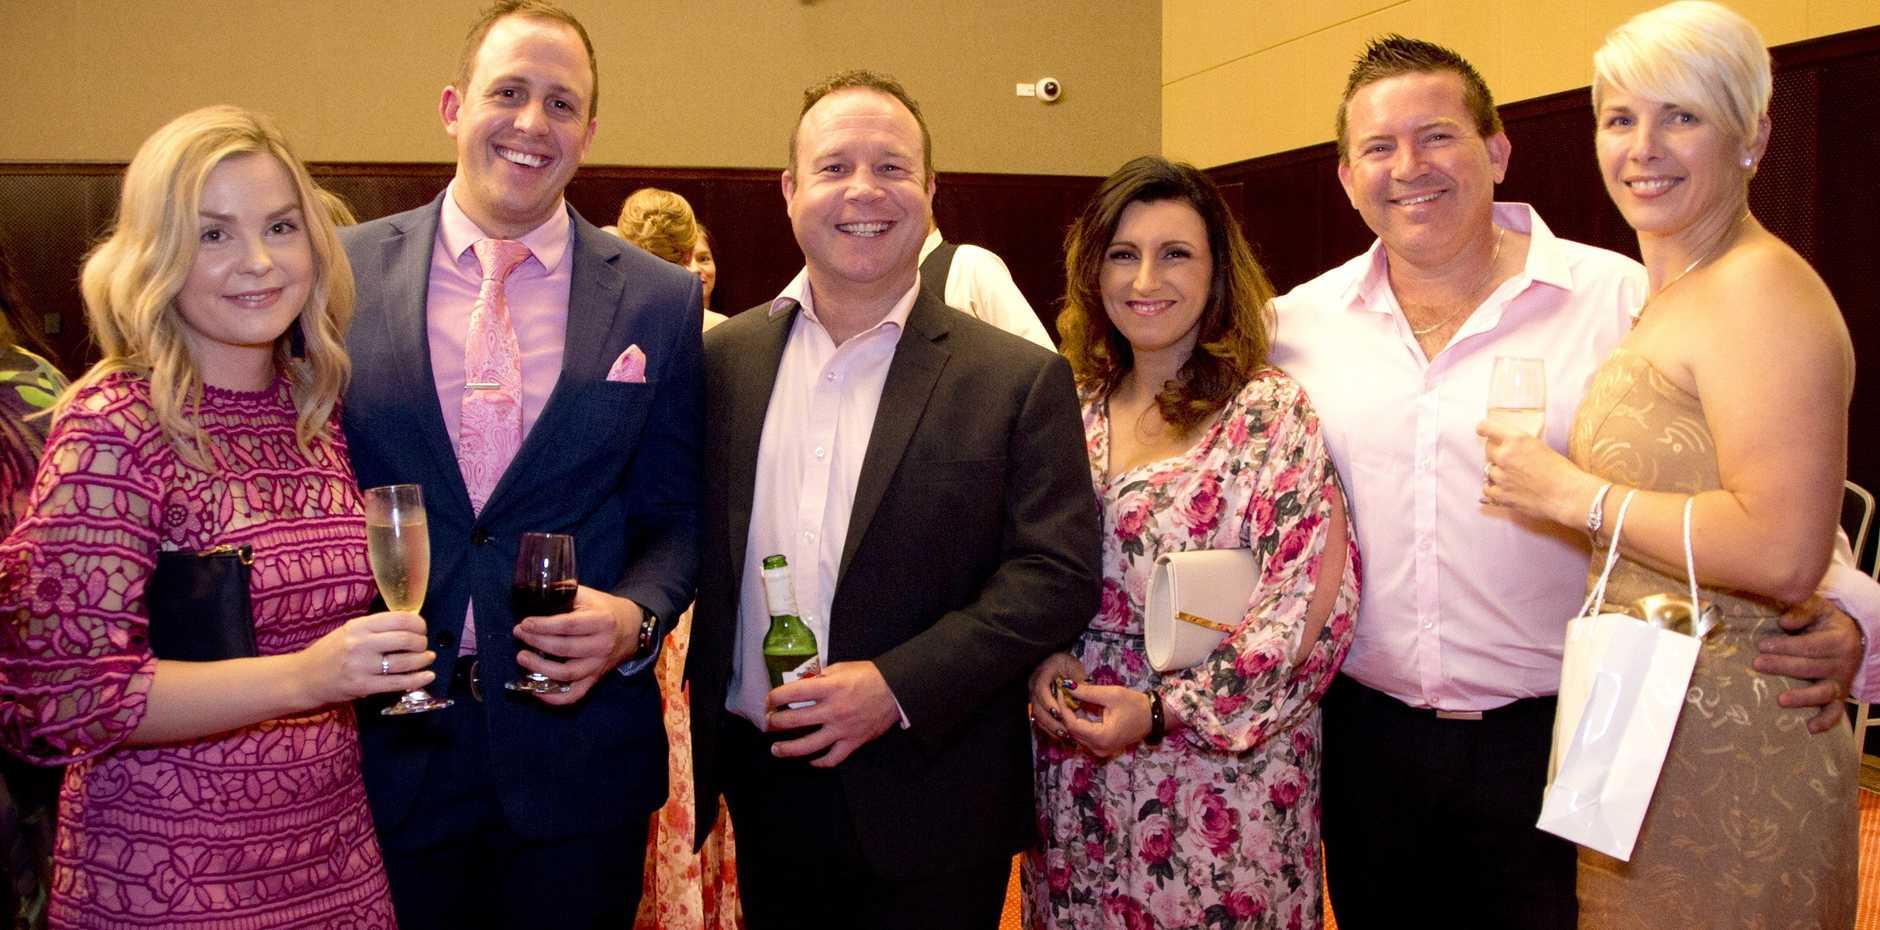 Pretty in Pink Gala guests, from left; Samantha Walker, Daniel Burrett, Scott Butler, Sally Harvey, Brett Harvey and Selena Park. The function raised funds for Toowoomba Hospital Foundation.